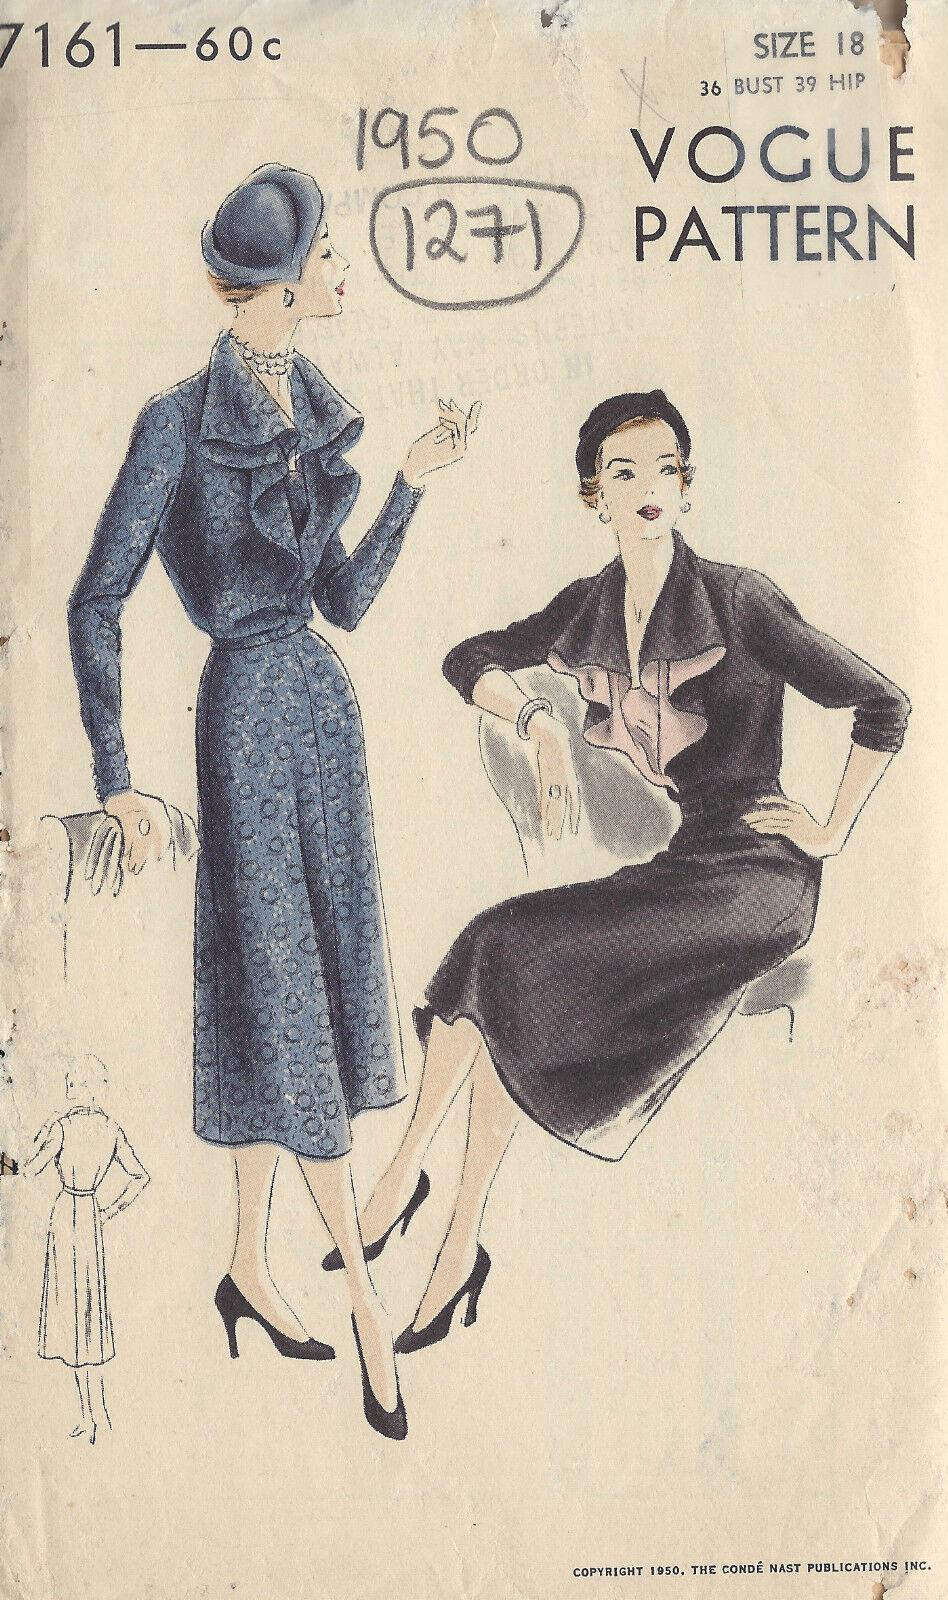 1950 Vintage Vogue-schnittmuster B36 Kleid (1271)   eBay